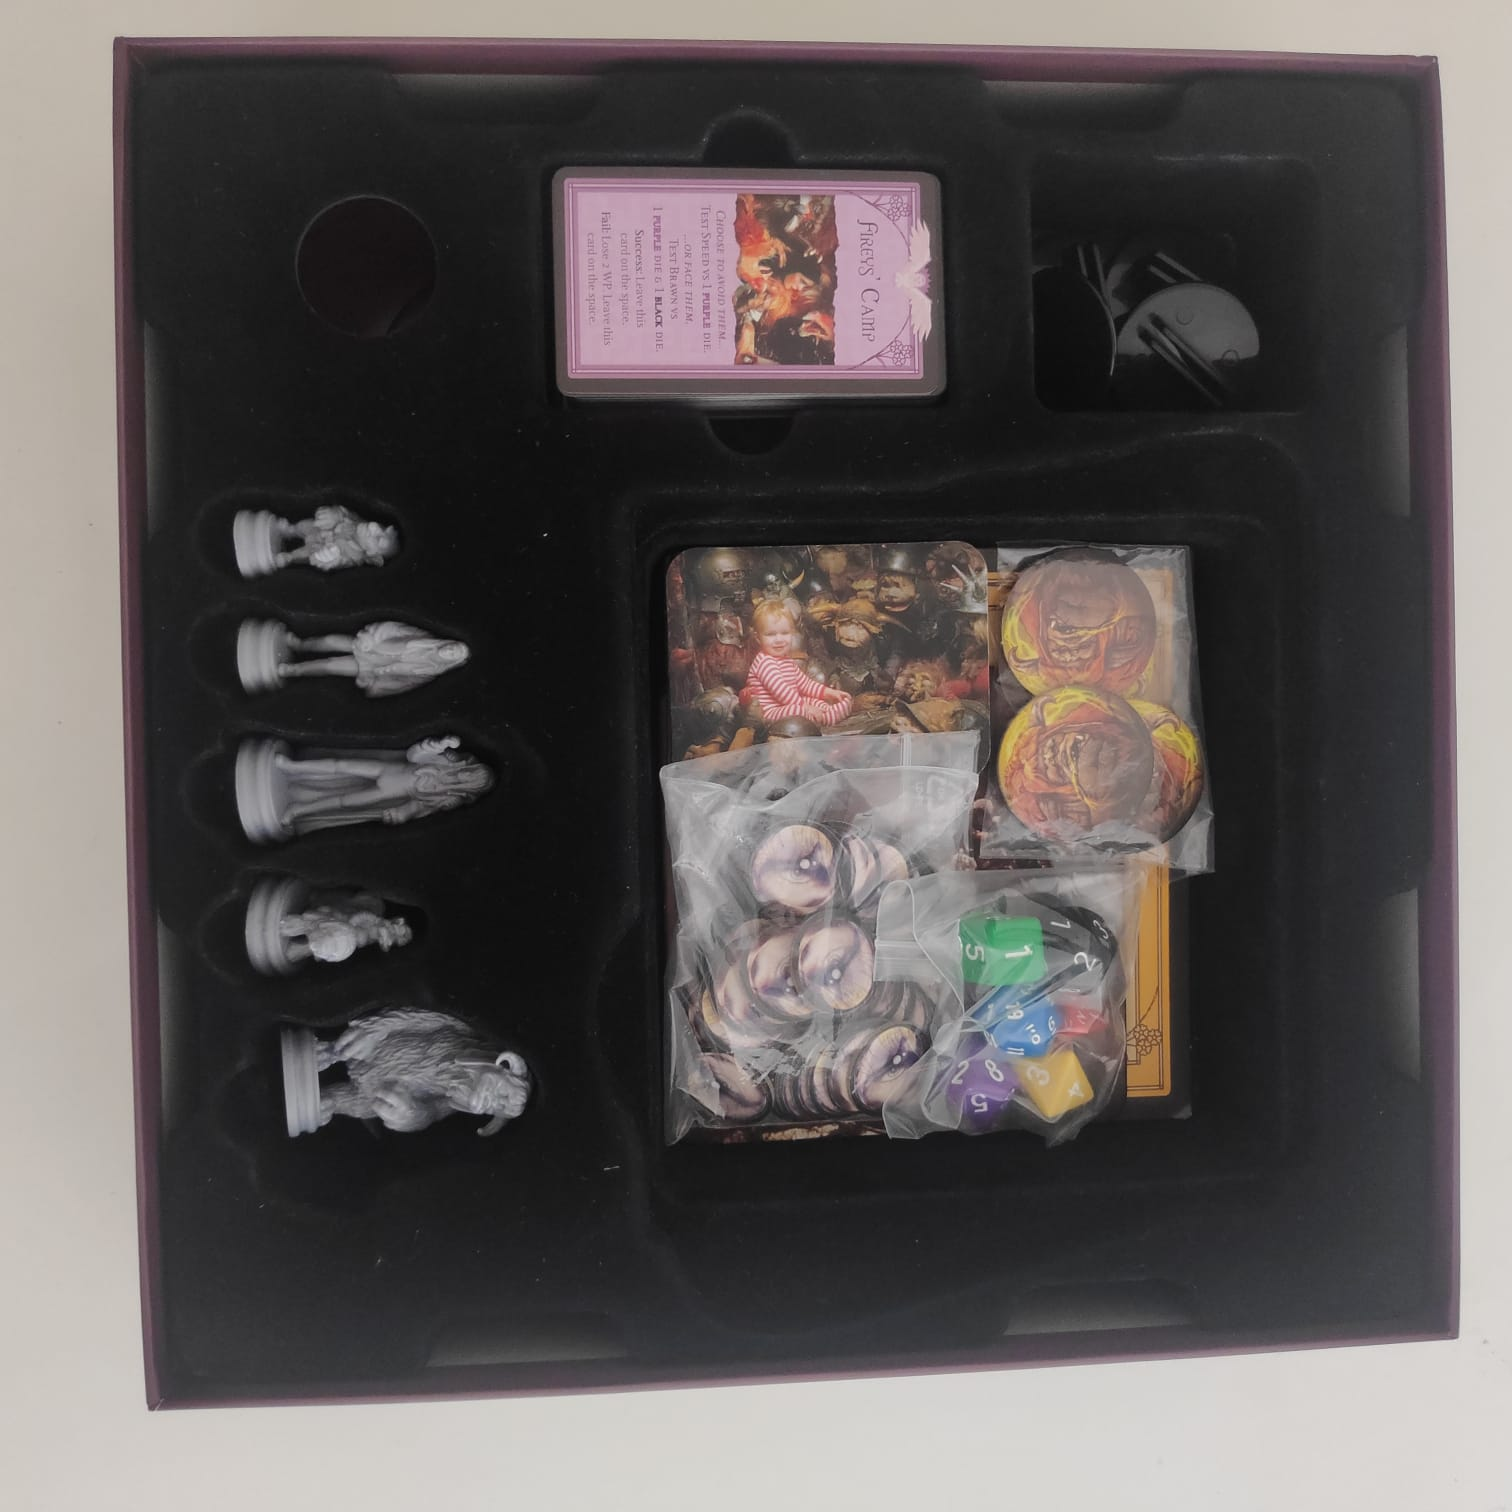 Jim Henson's Labyrinth: The Board Game - BAZAR DOS ALQUIMISTAS